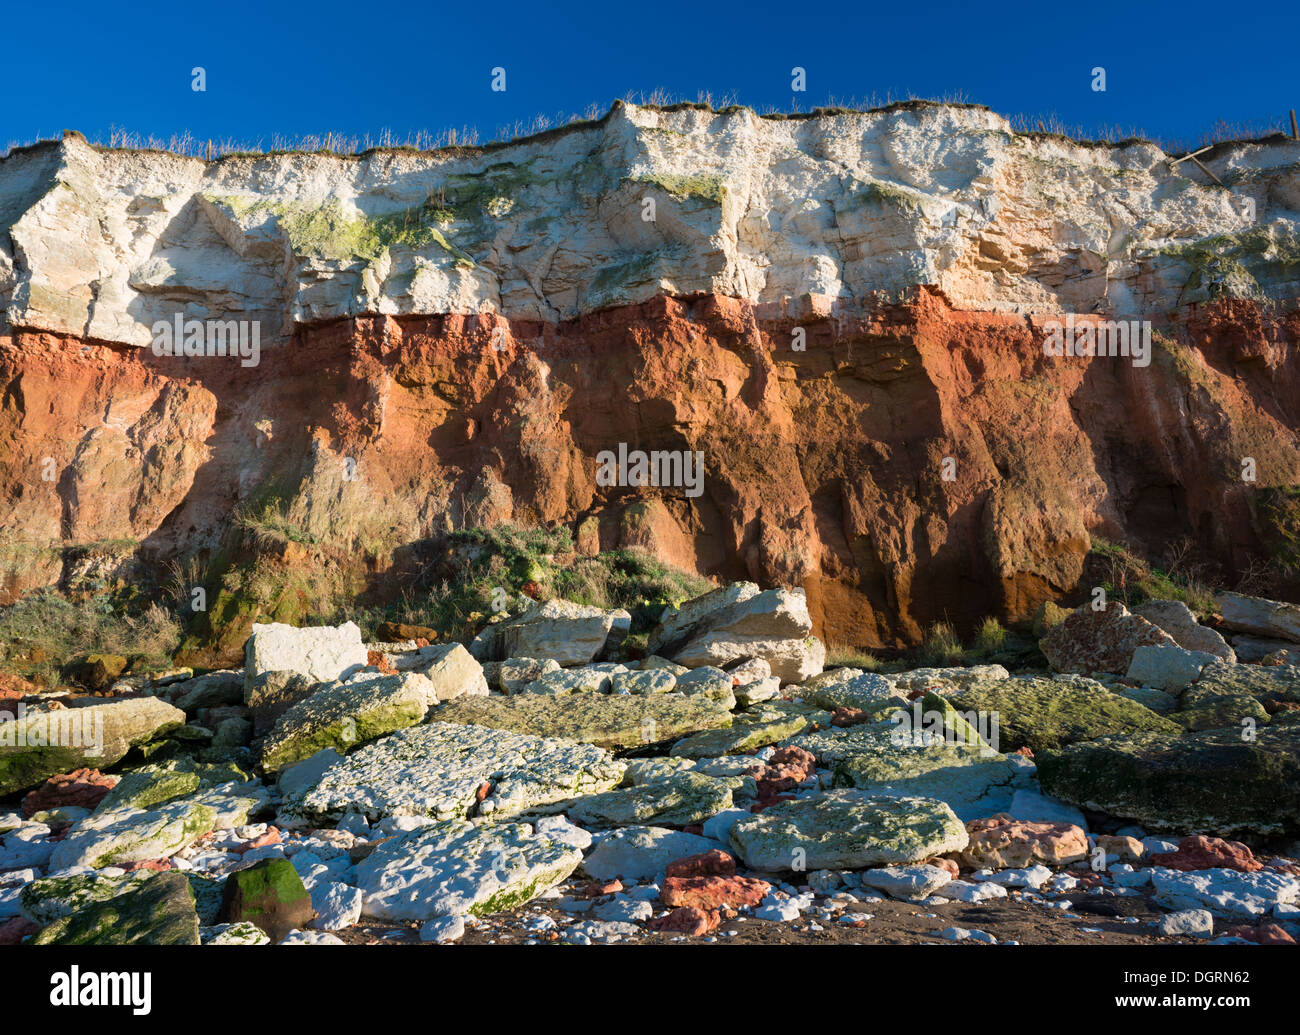 the-cliff-at-hunstanton-norfolk-england-DGRN62.jpg